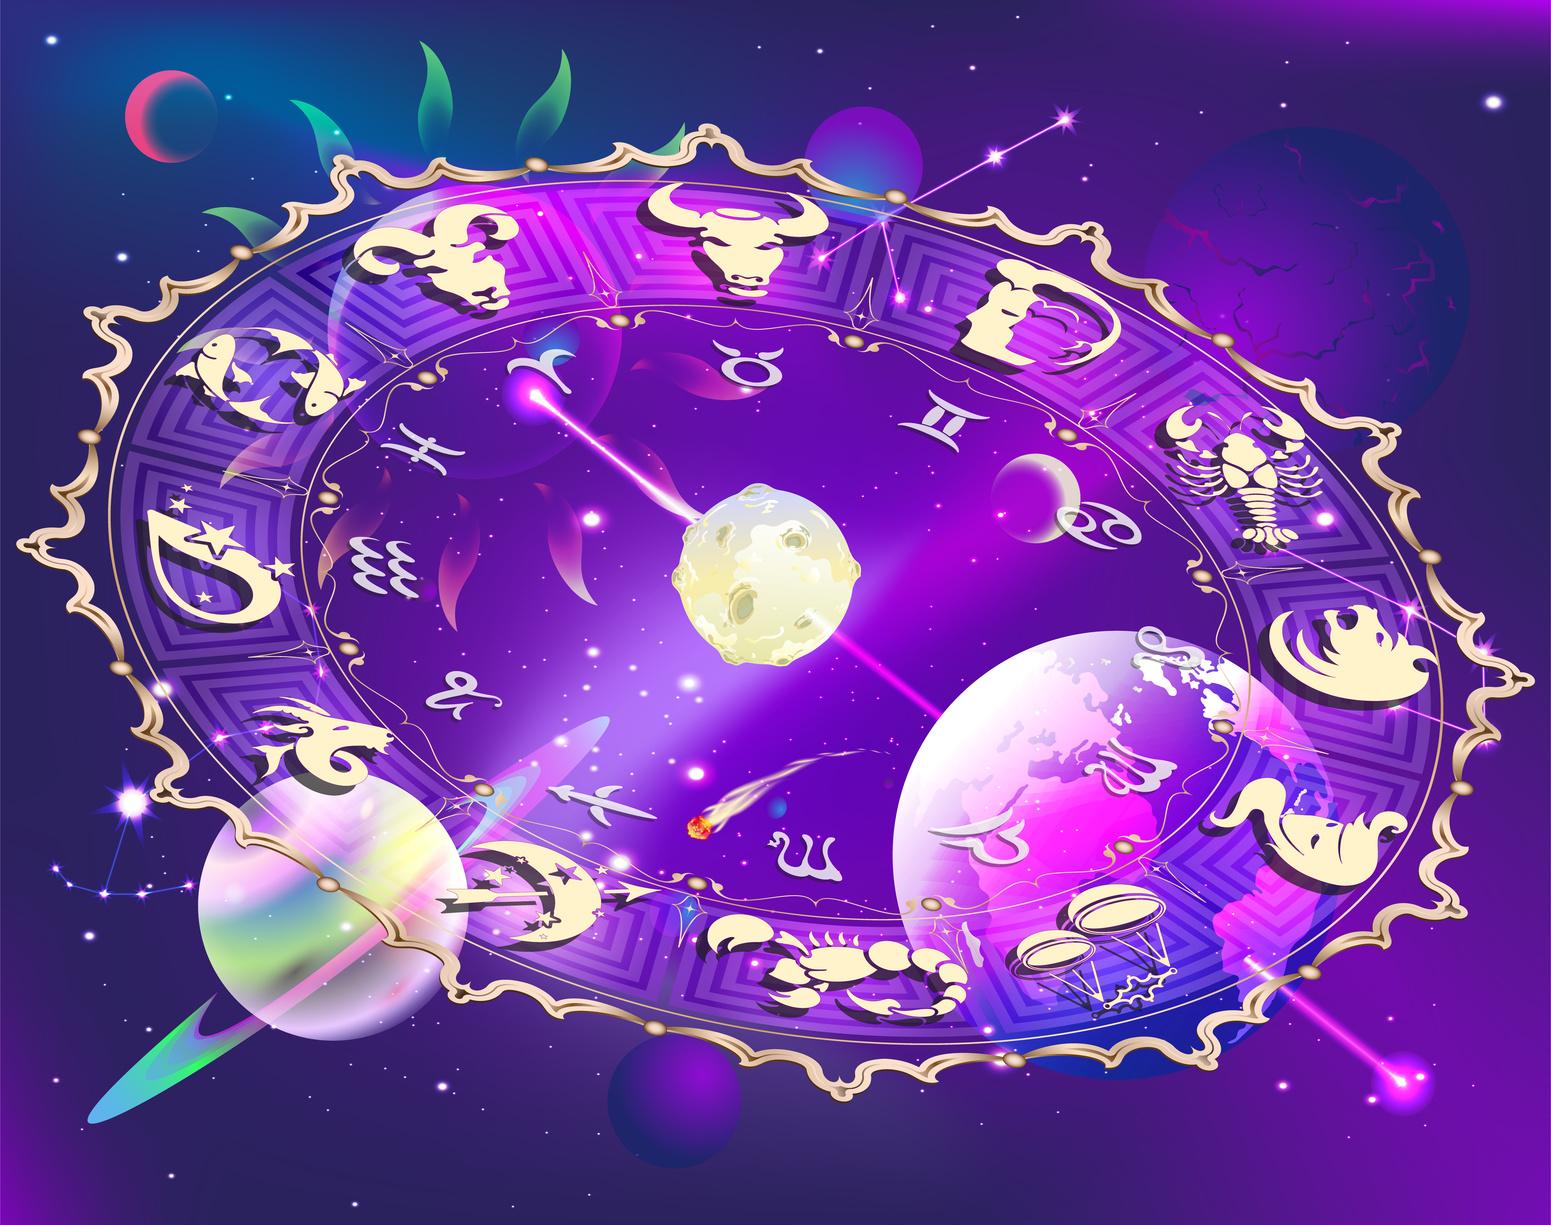 El Horoscopo Del Dia - Horóscopo Diario Gratis